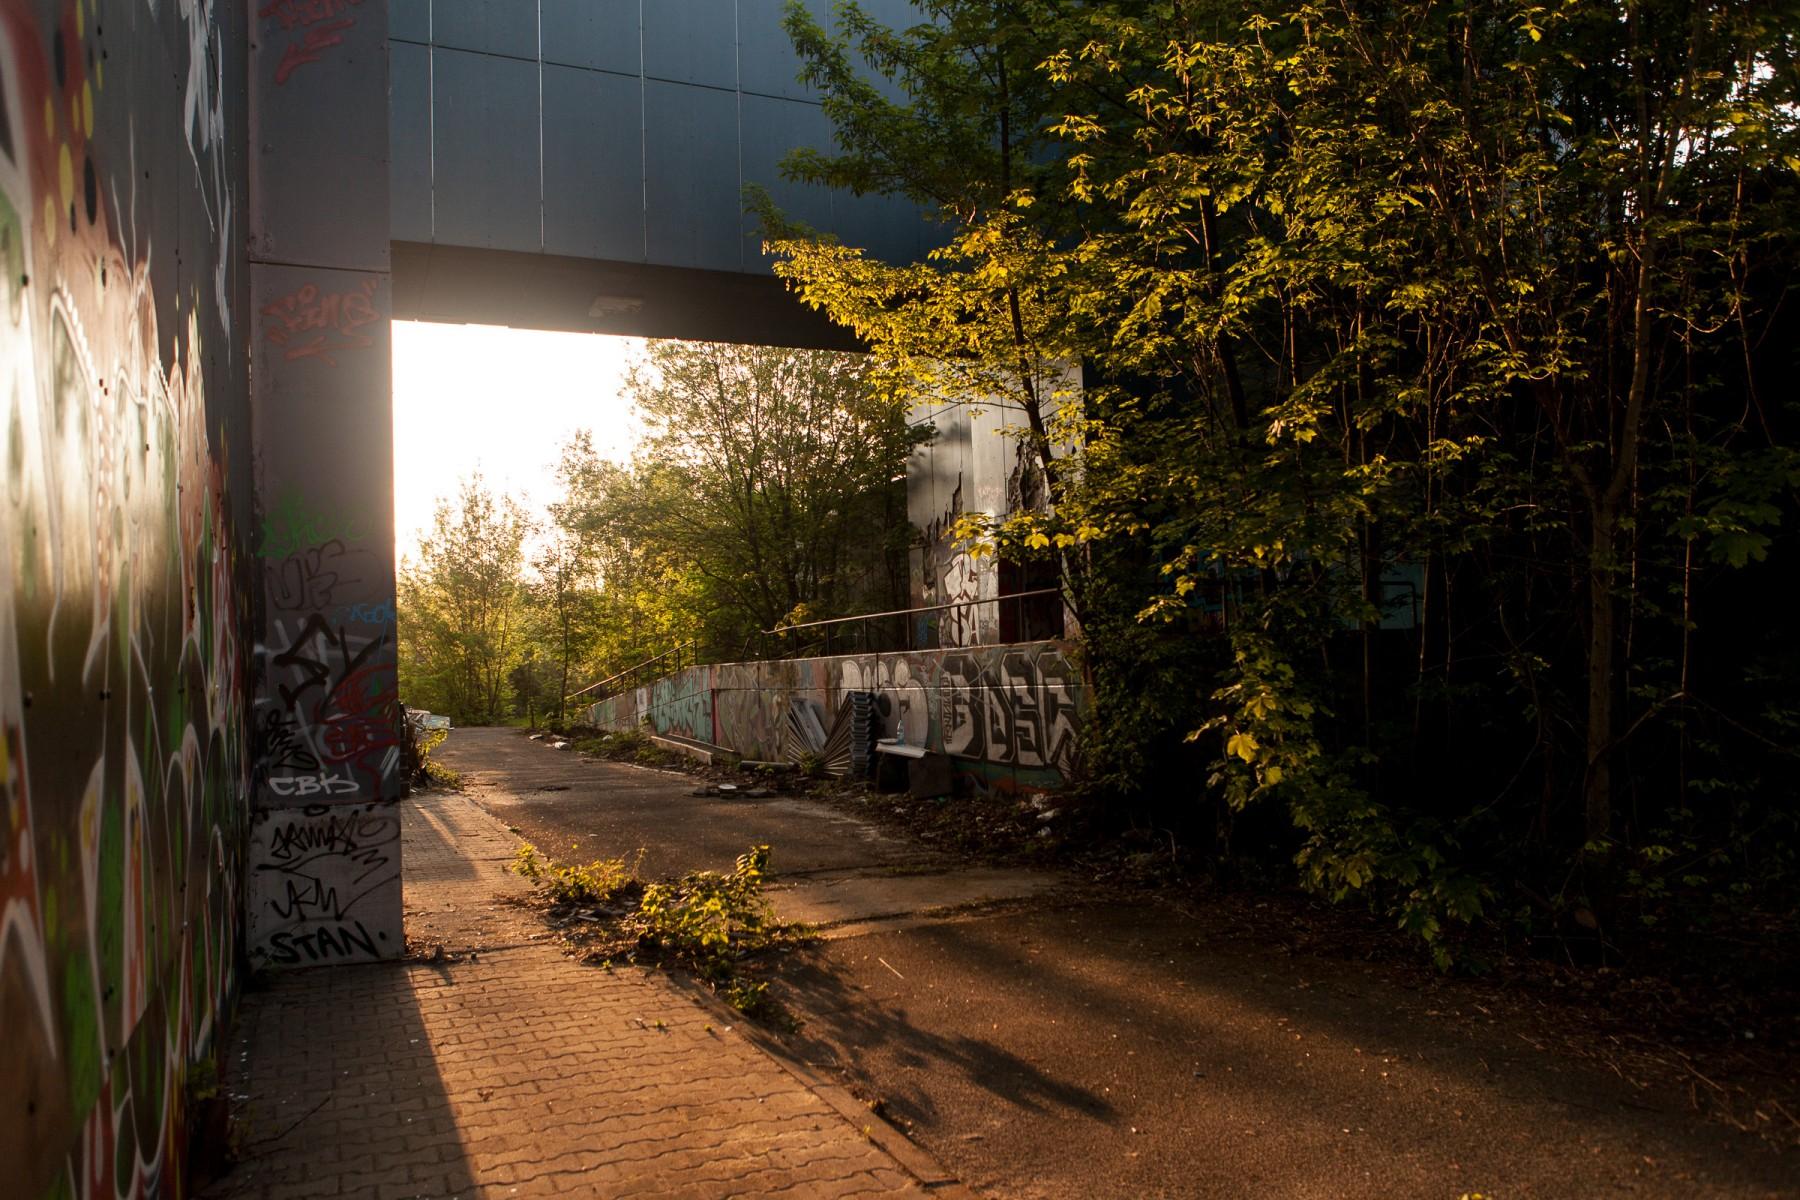 Sunrise at T-Berg